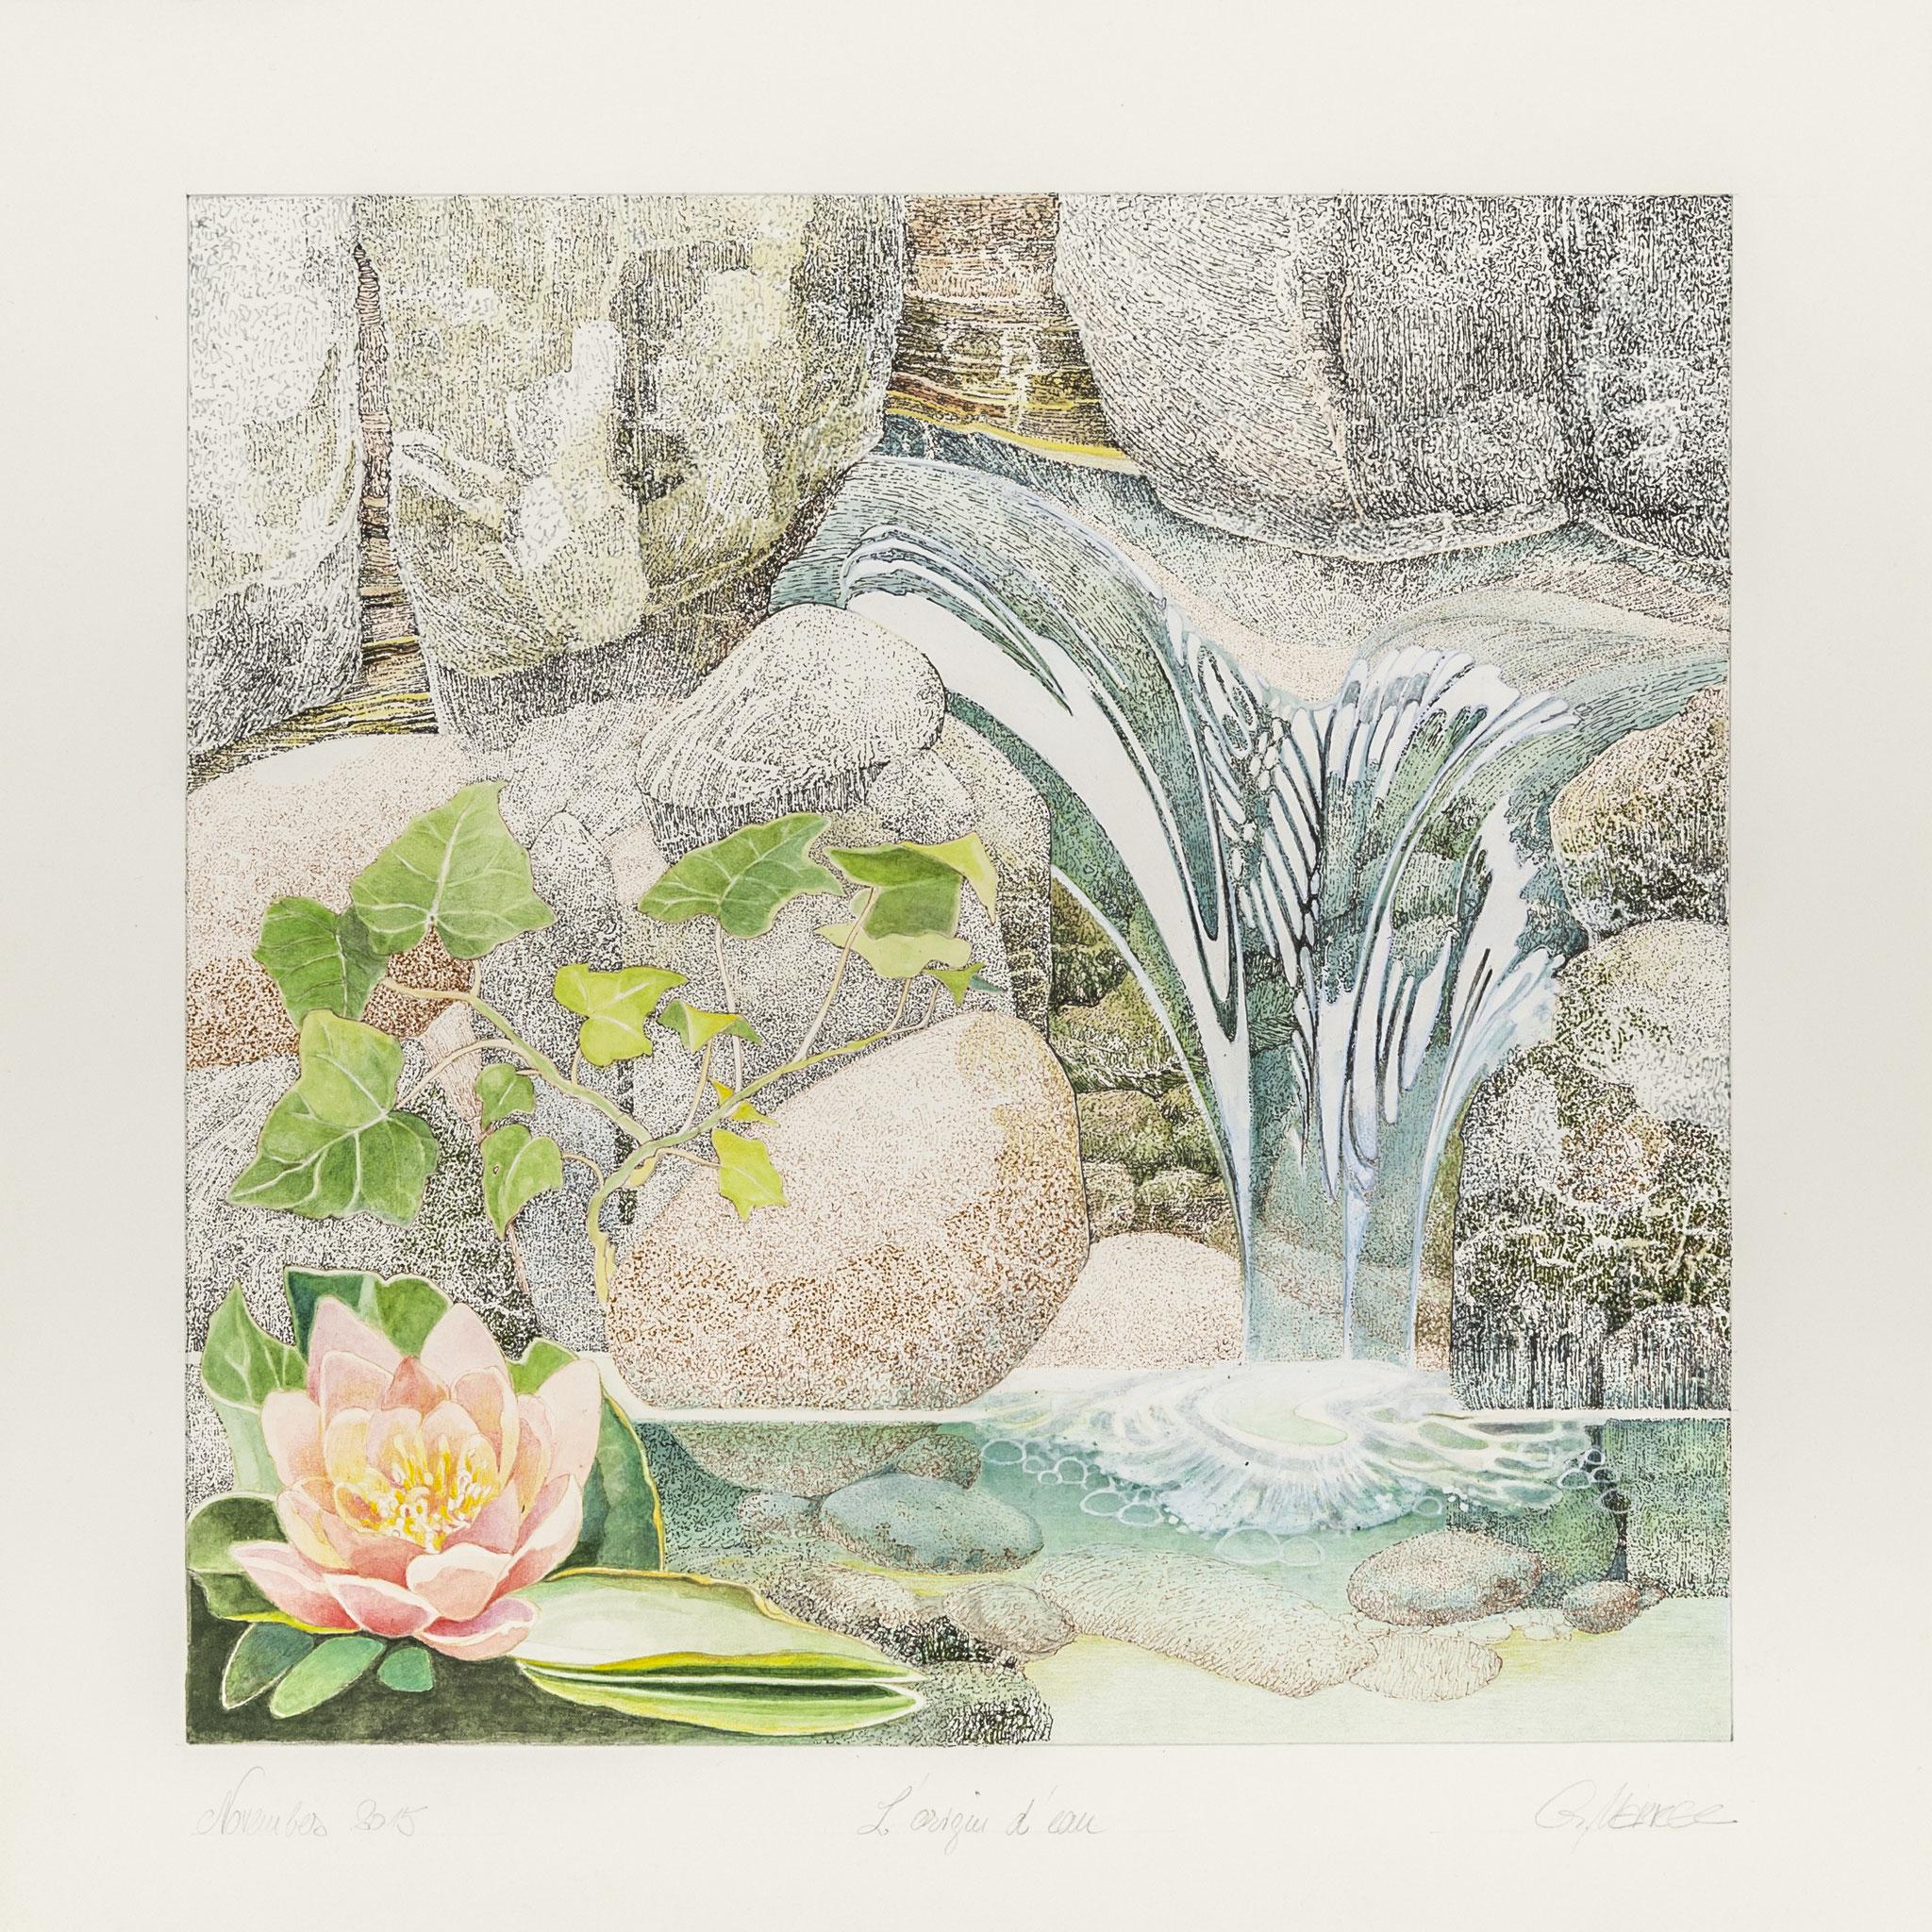 L´Origine d´eau, 2016, Farbstifte, Tusche, Arches-Büttenpapier, 26*26 cm, 1080 €